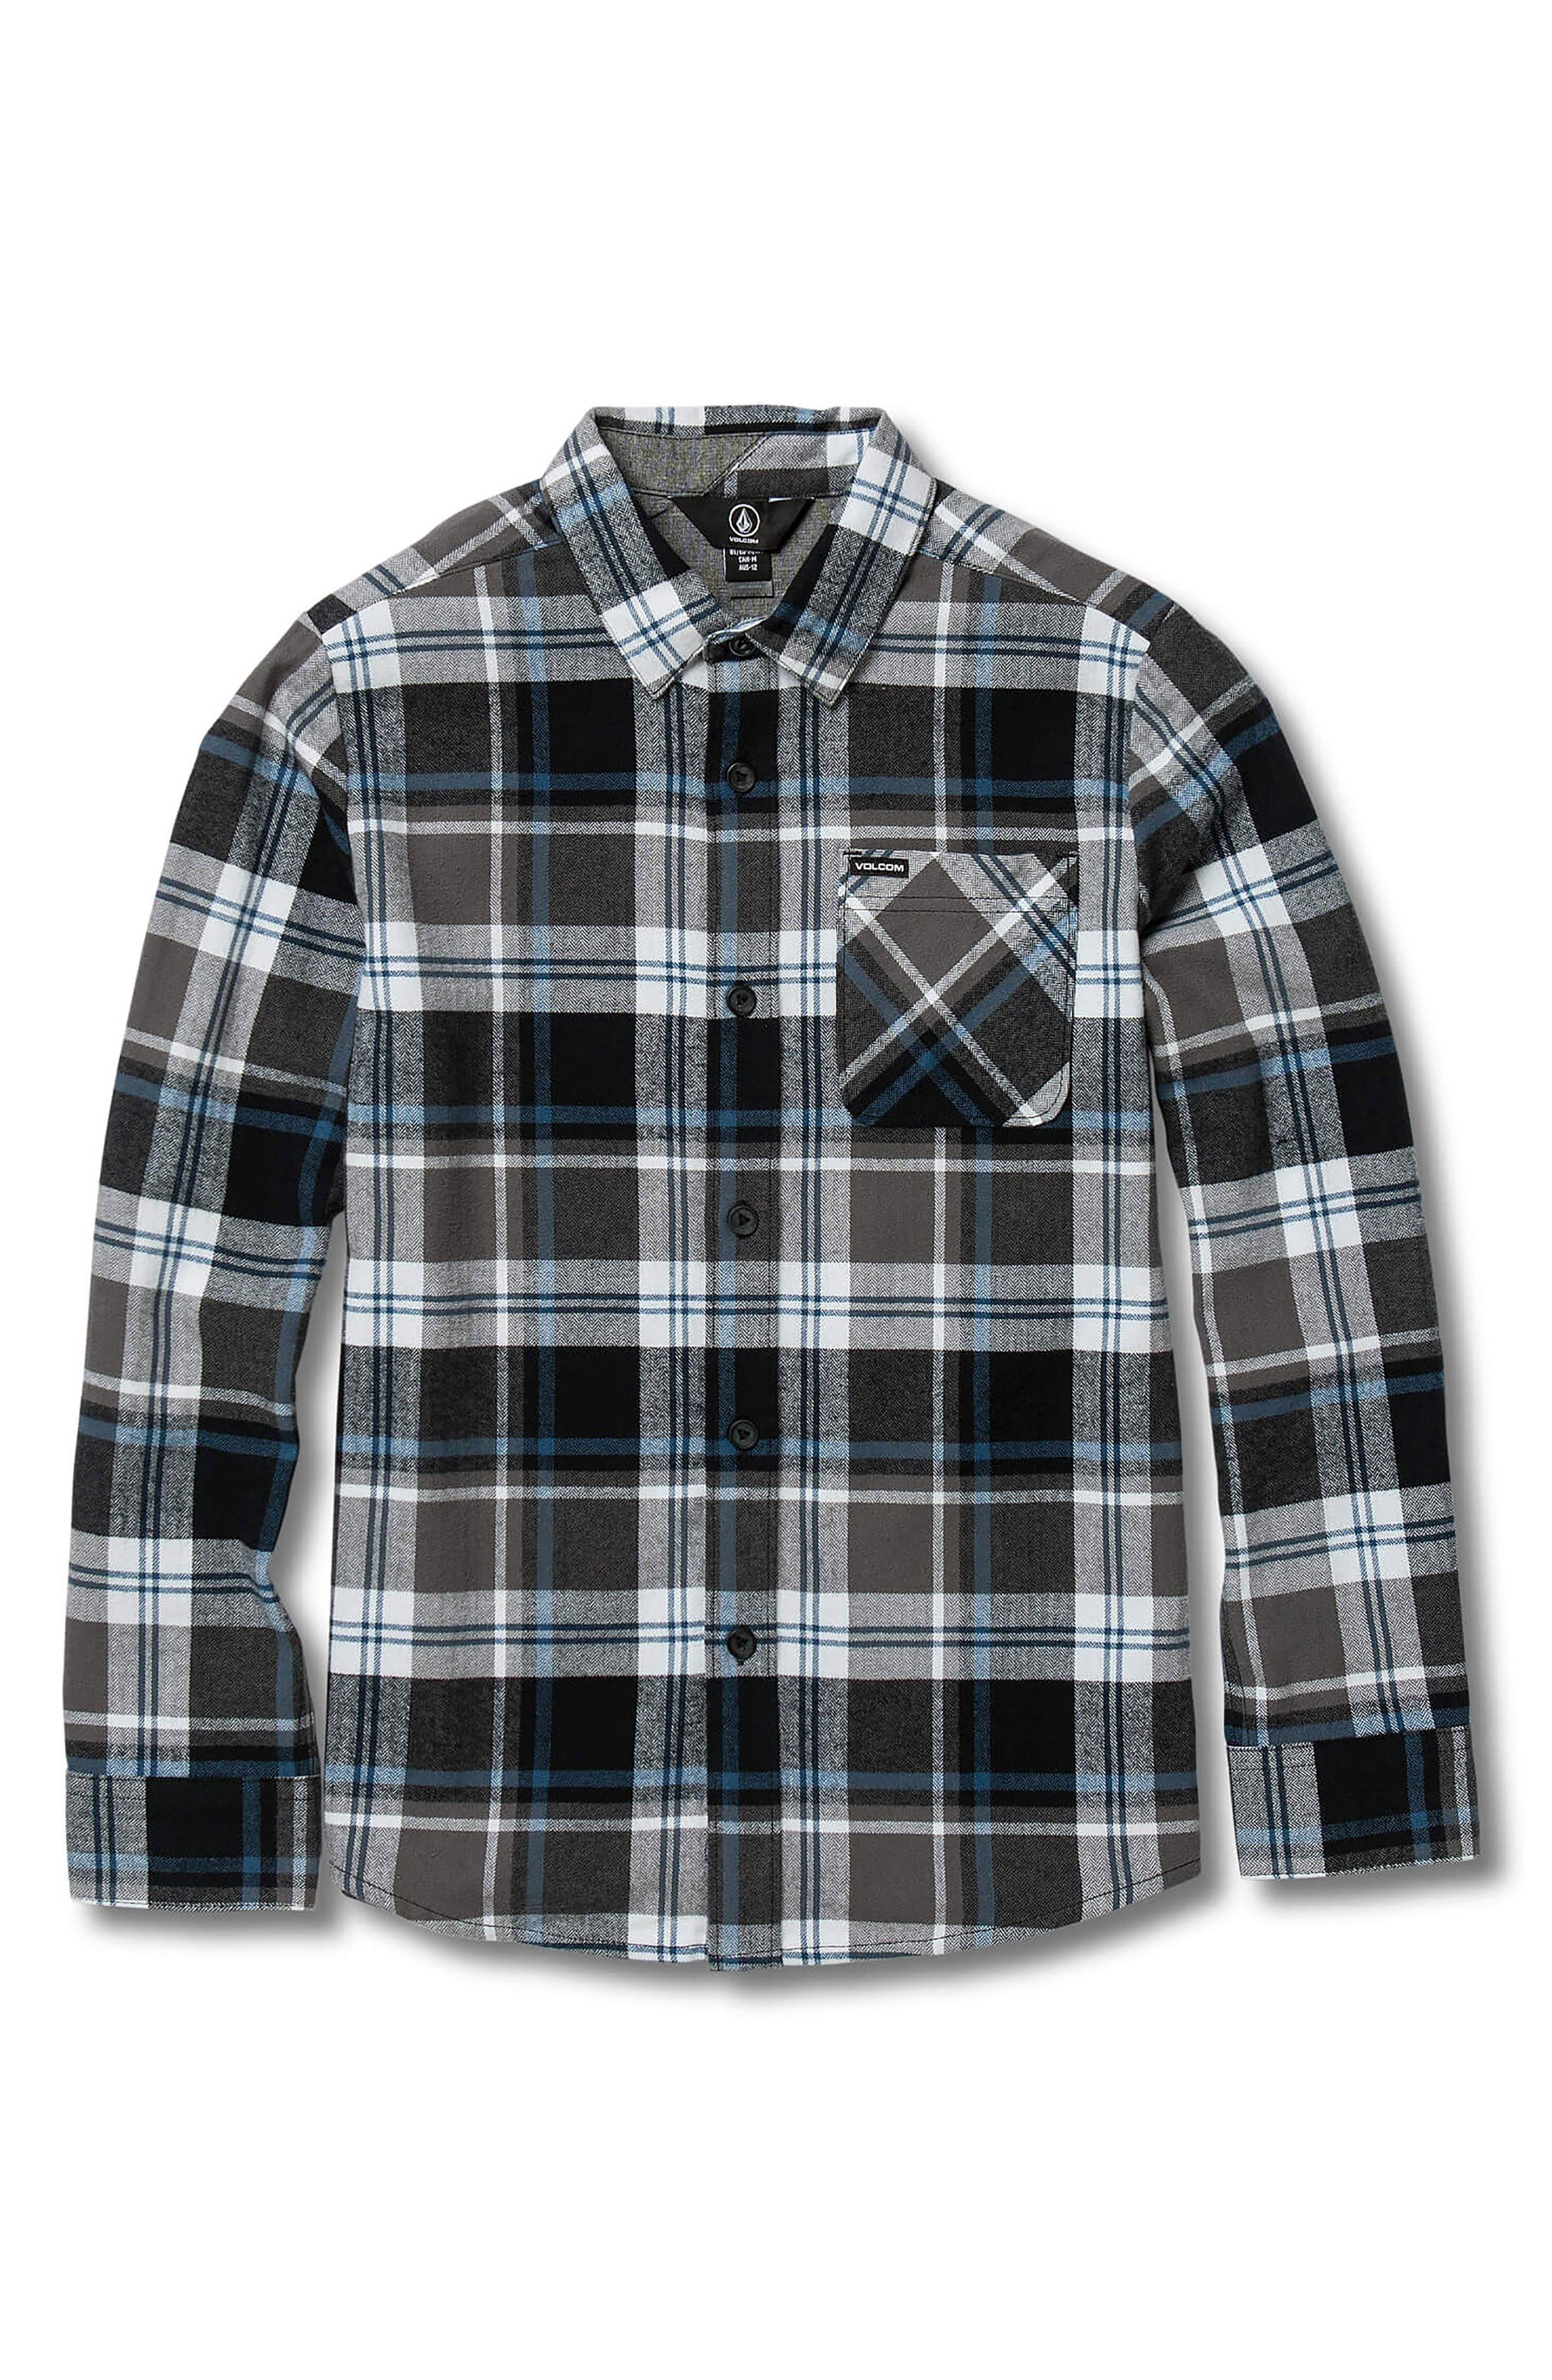 VOLCOM, Caden Plaid Flannel Shirt, Main thumbnail 1, color, PEWTER